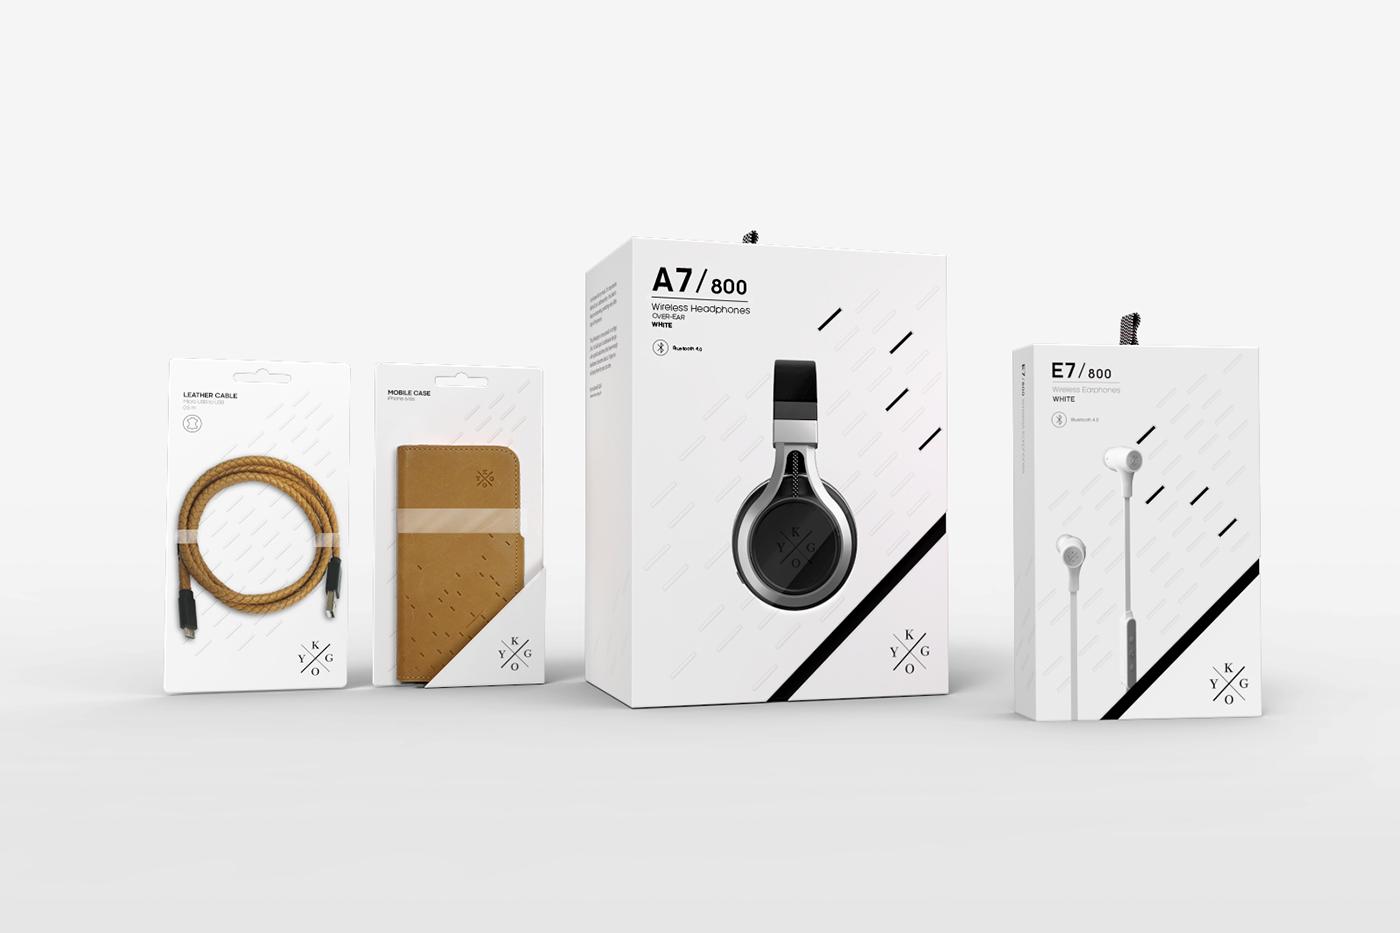 kygo panorama design Fashion  Packaging design identity